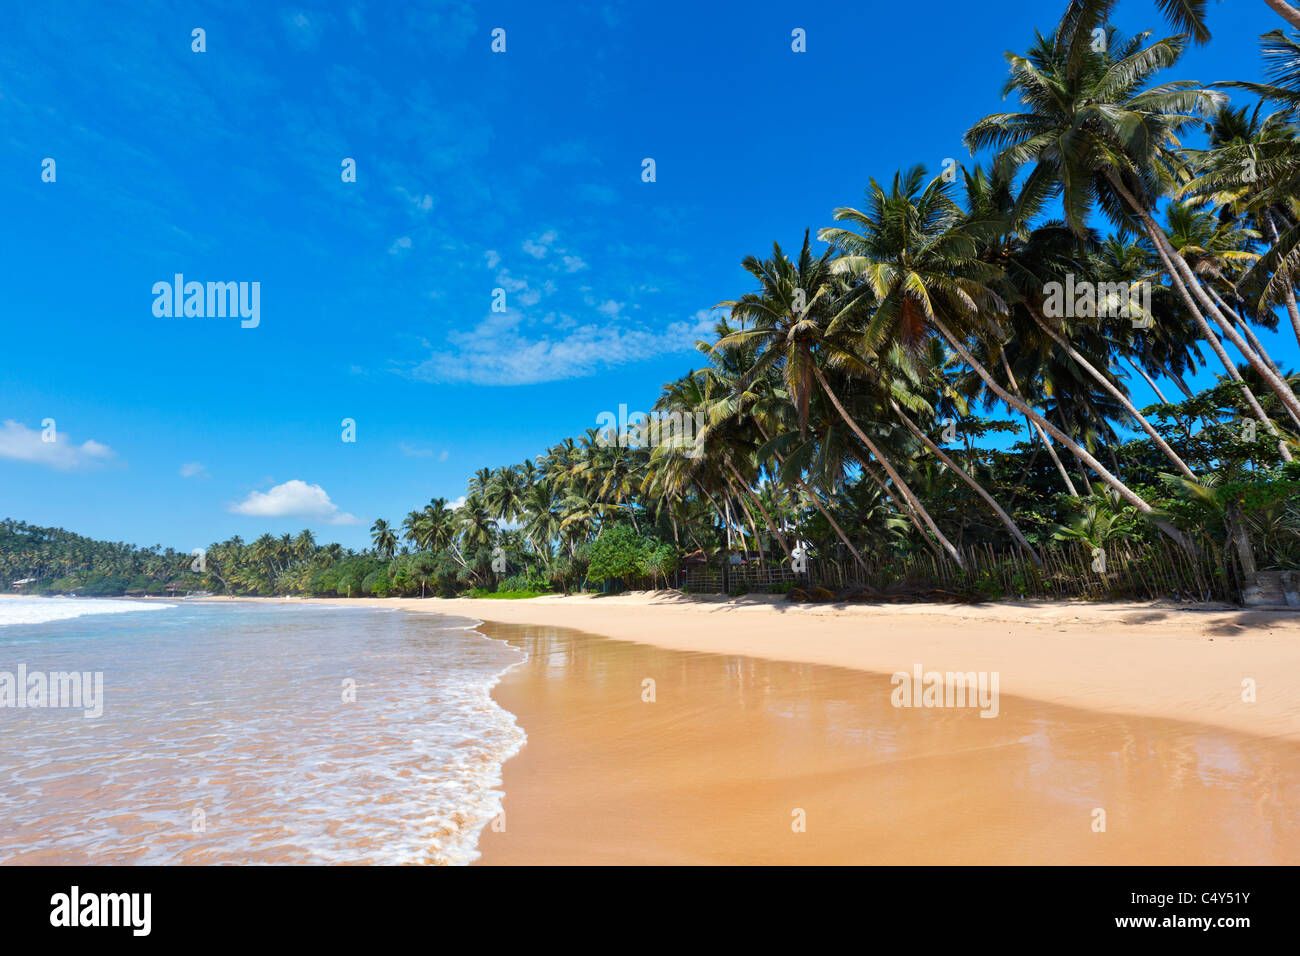 Tropisches Paradies Traumstrand. Sri Lanka Stockbild